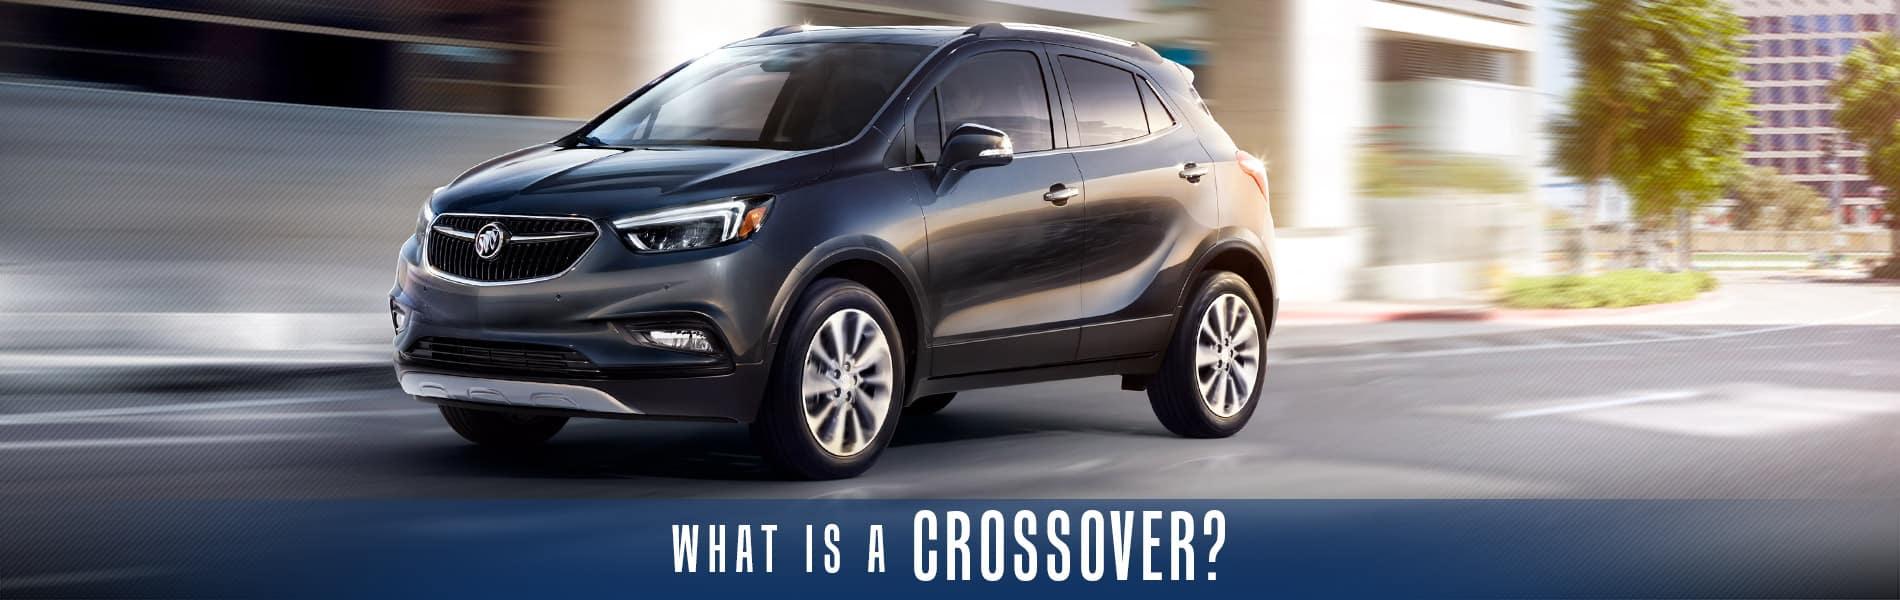 2019 Buick Encore - Crossover